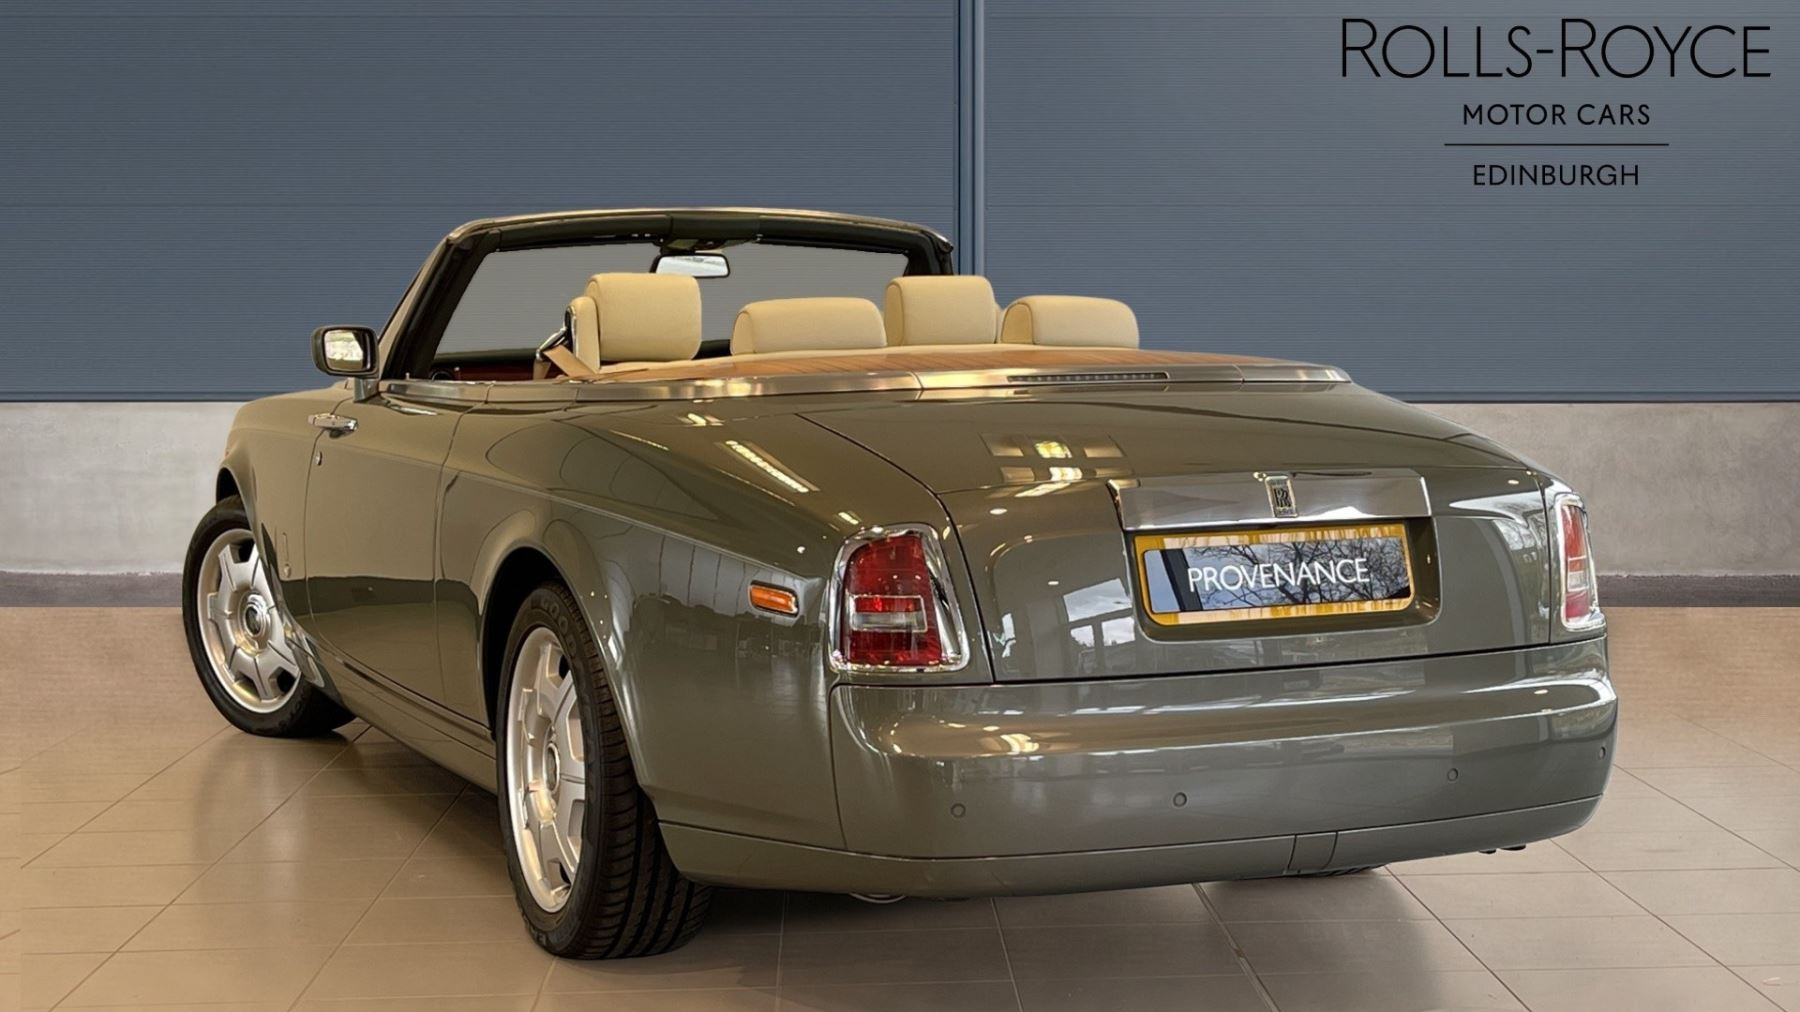 Rolls-Royce Phantom Drophead Coupe 2dr Auto image 3